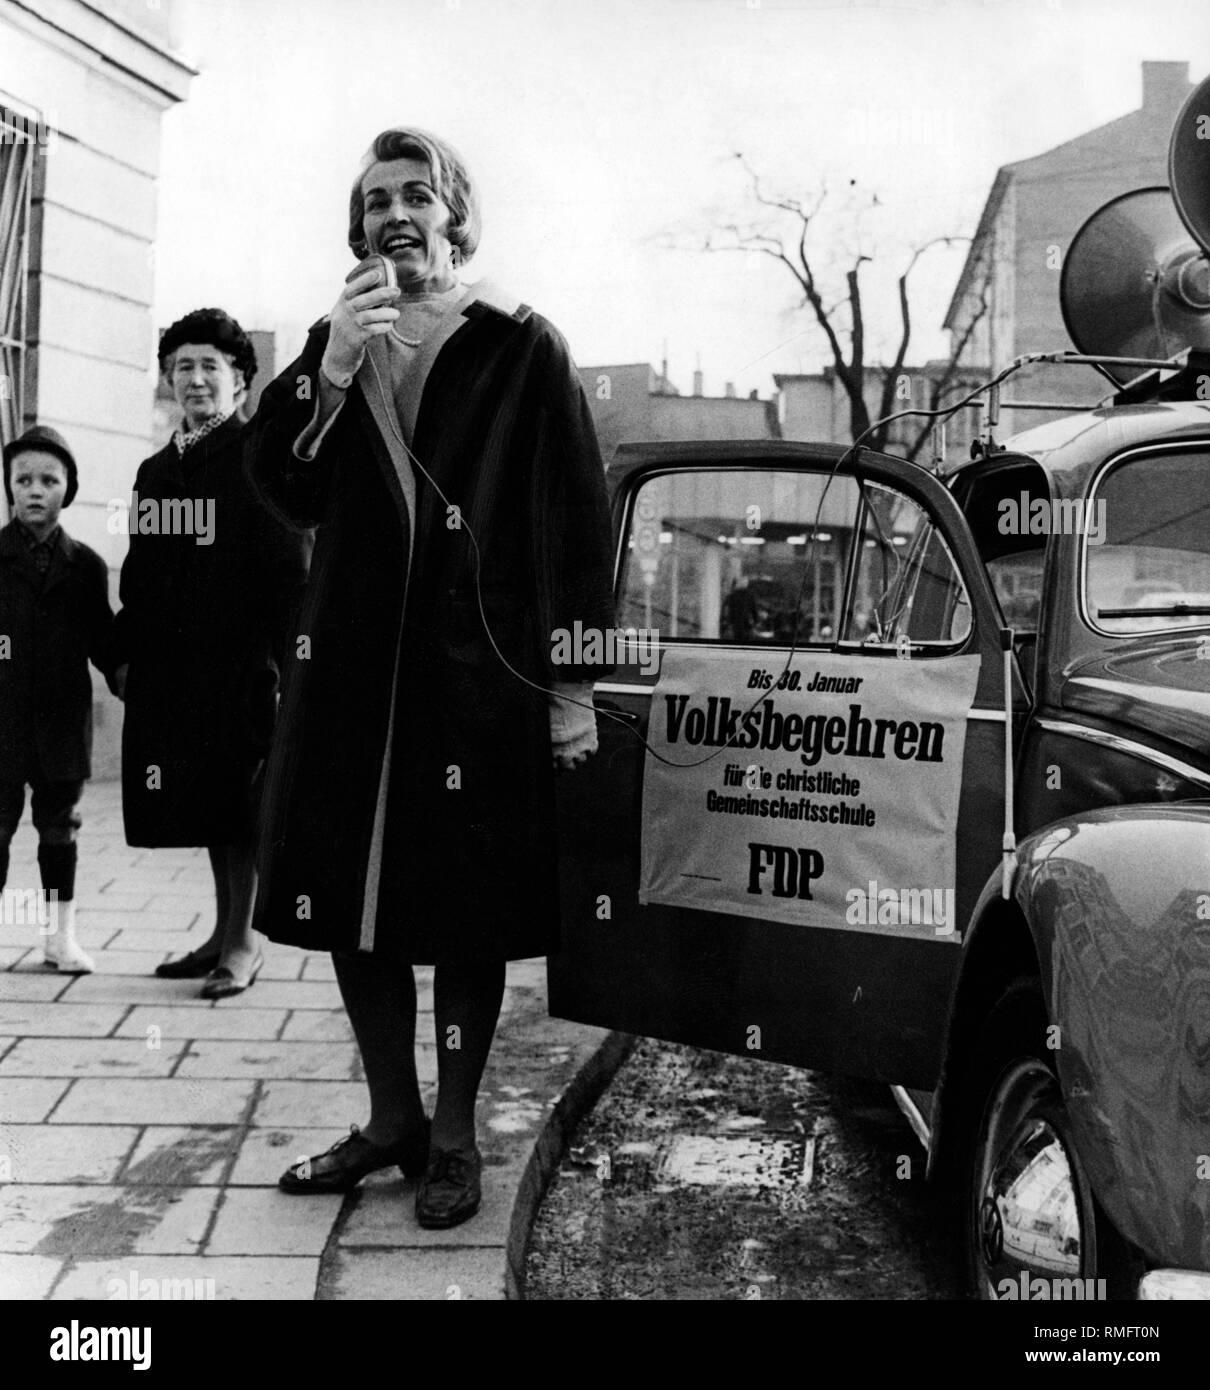 The FDP politician Hildegard Hamm-Bruecher near a VW Beetle promotes the referendum on the Christian Common School. - Stock Image